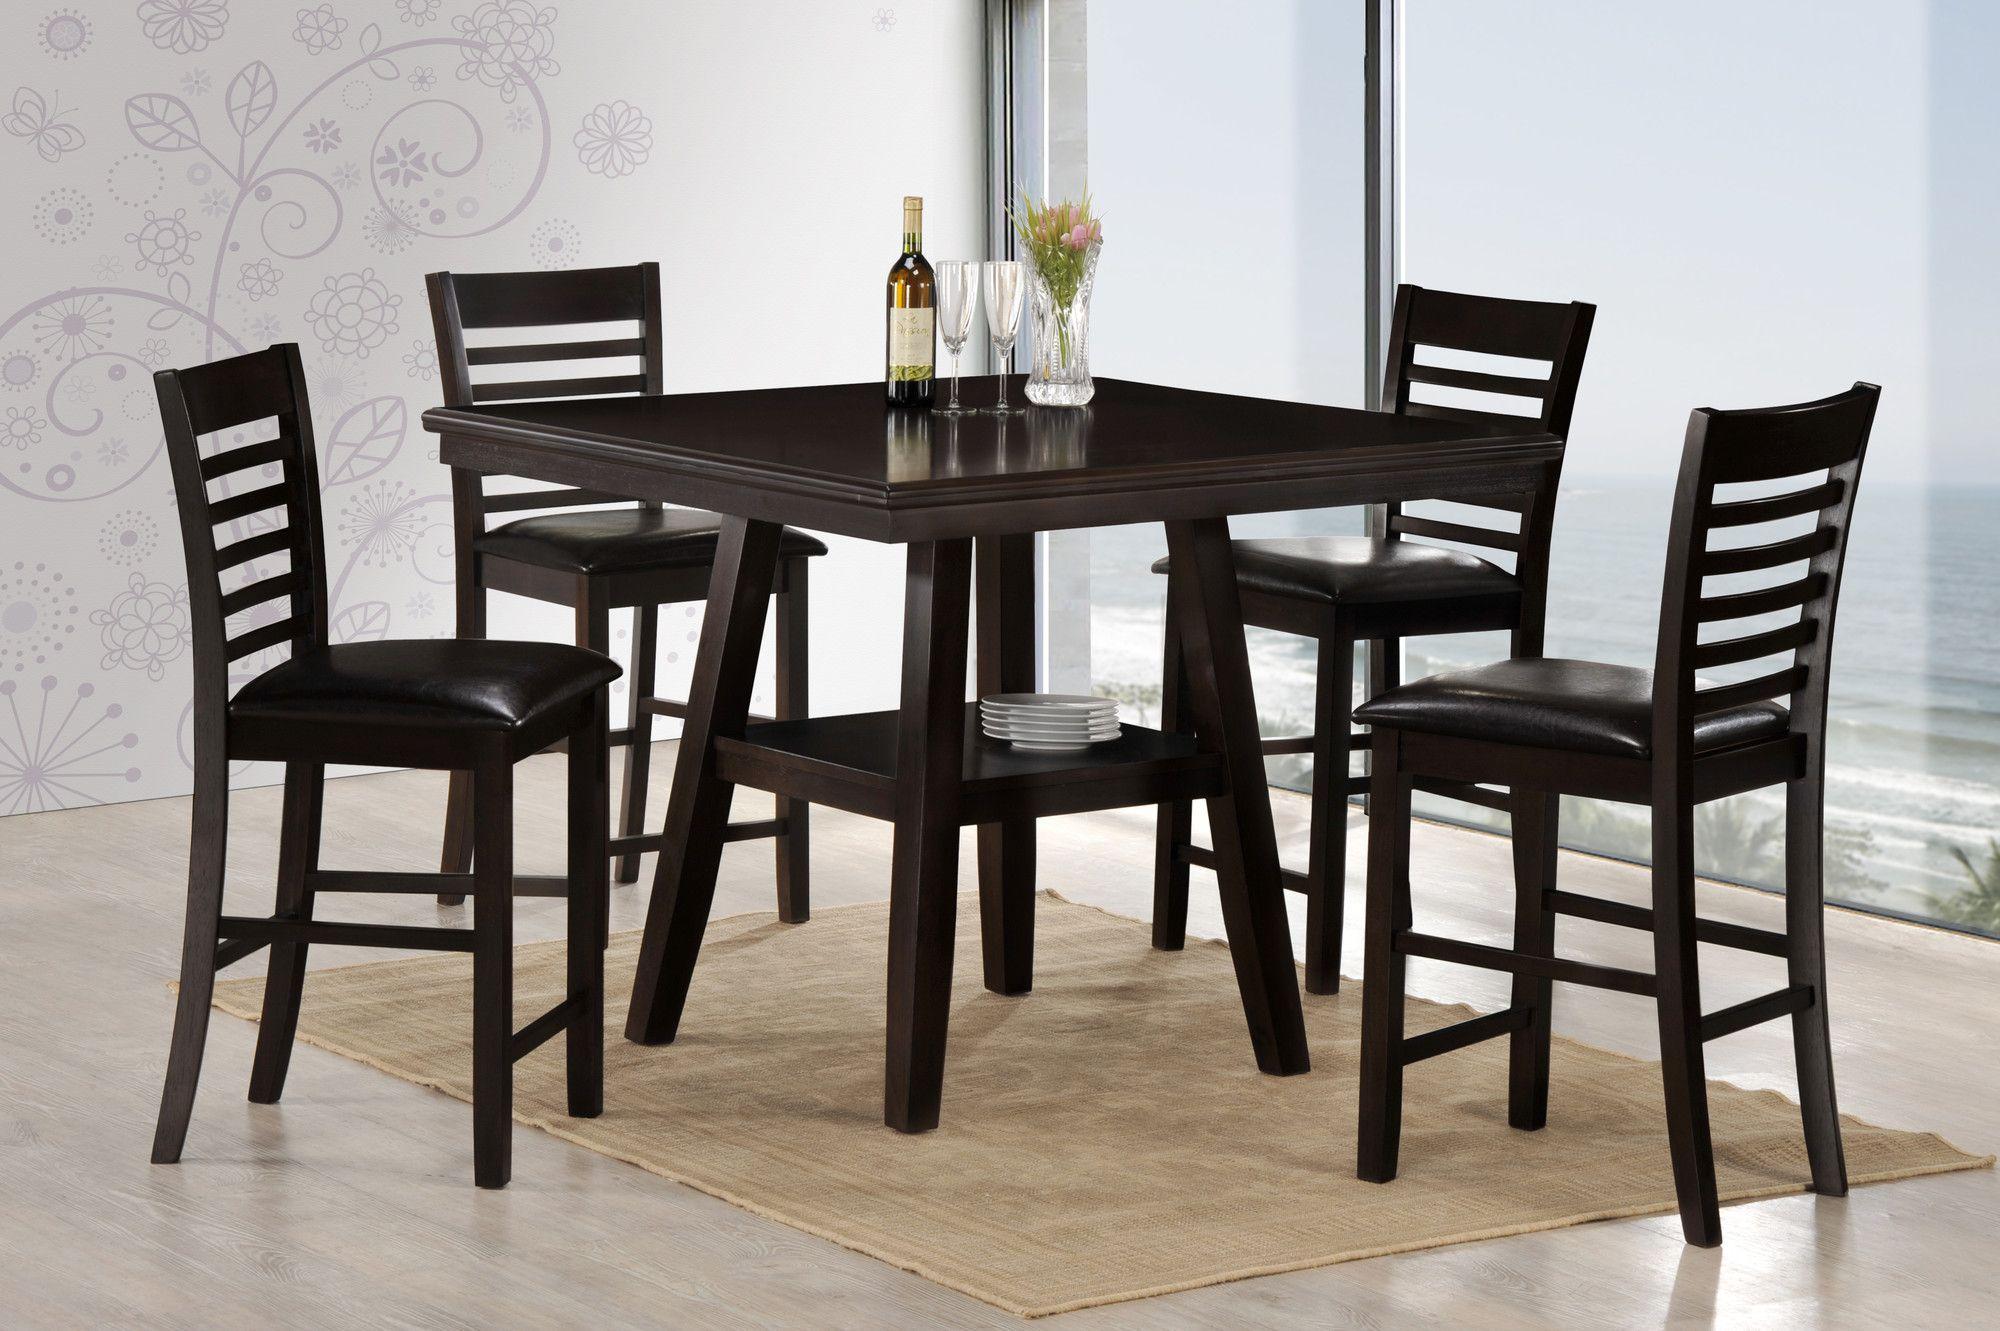 Simmons casegoods harrells bar stool counter height dining tabledining tablestraditional